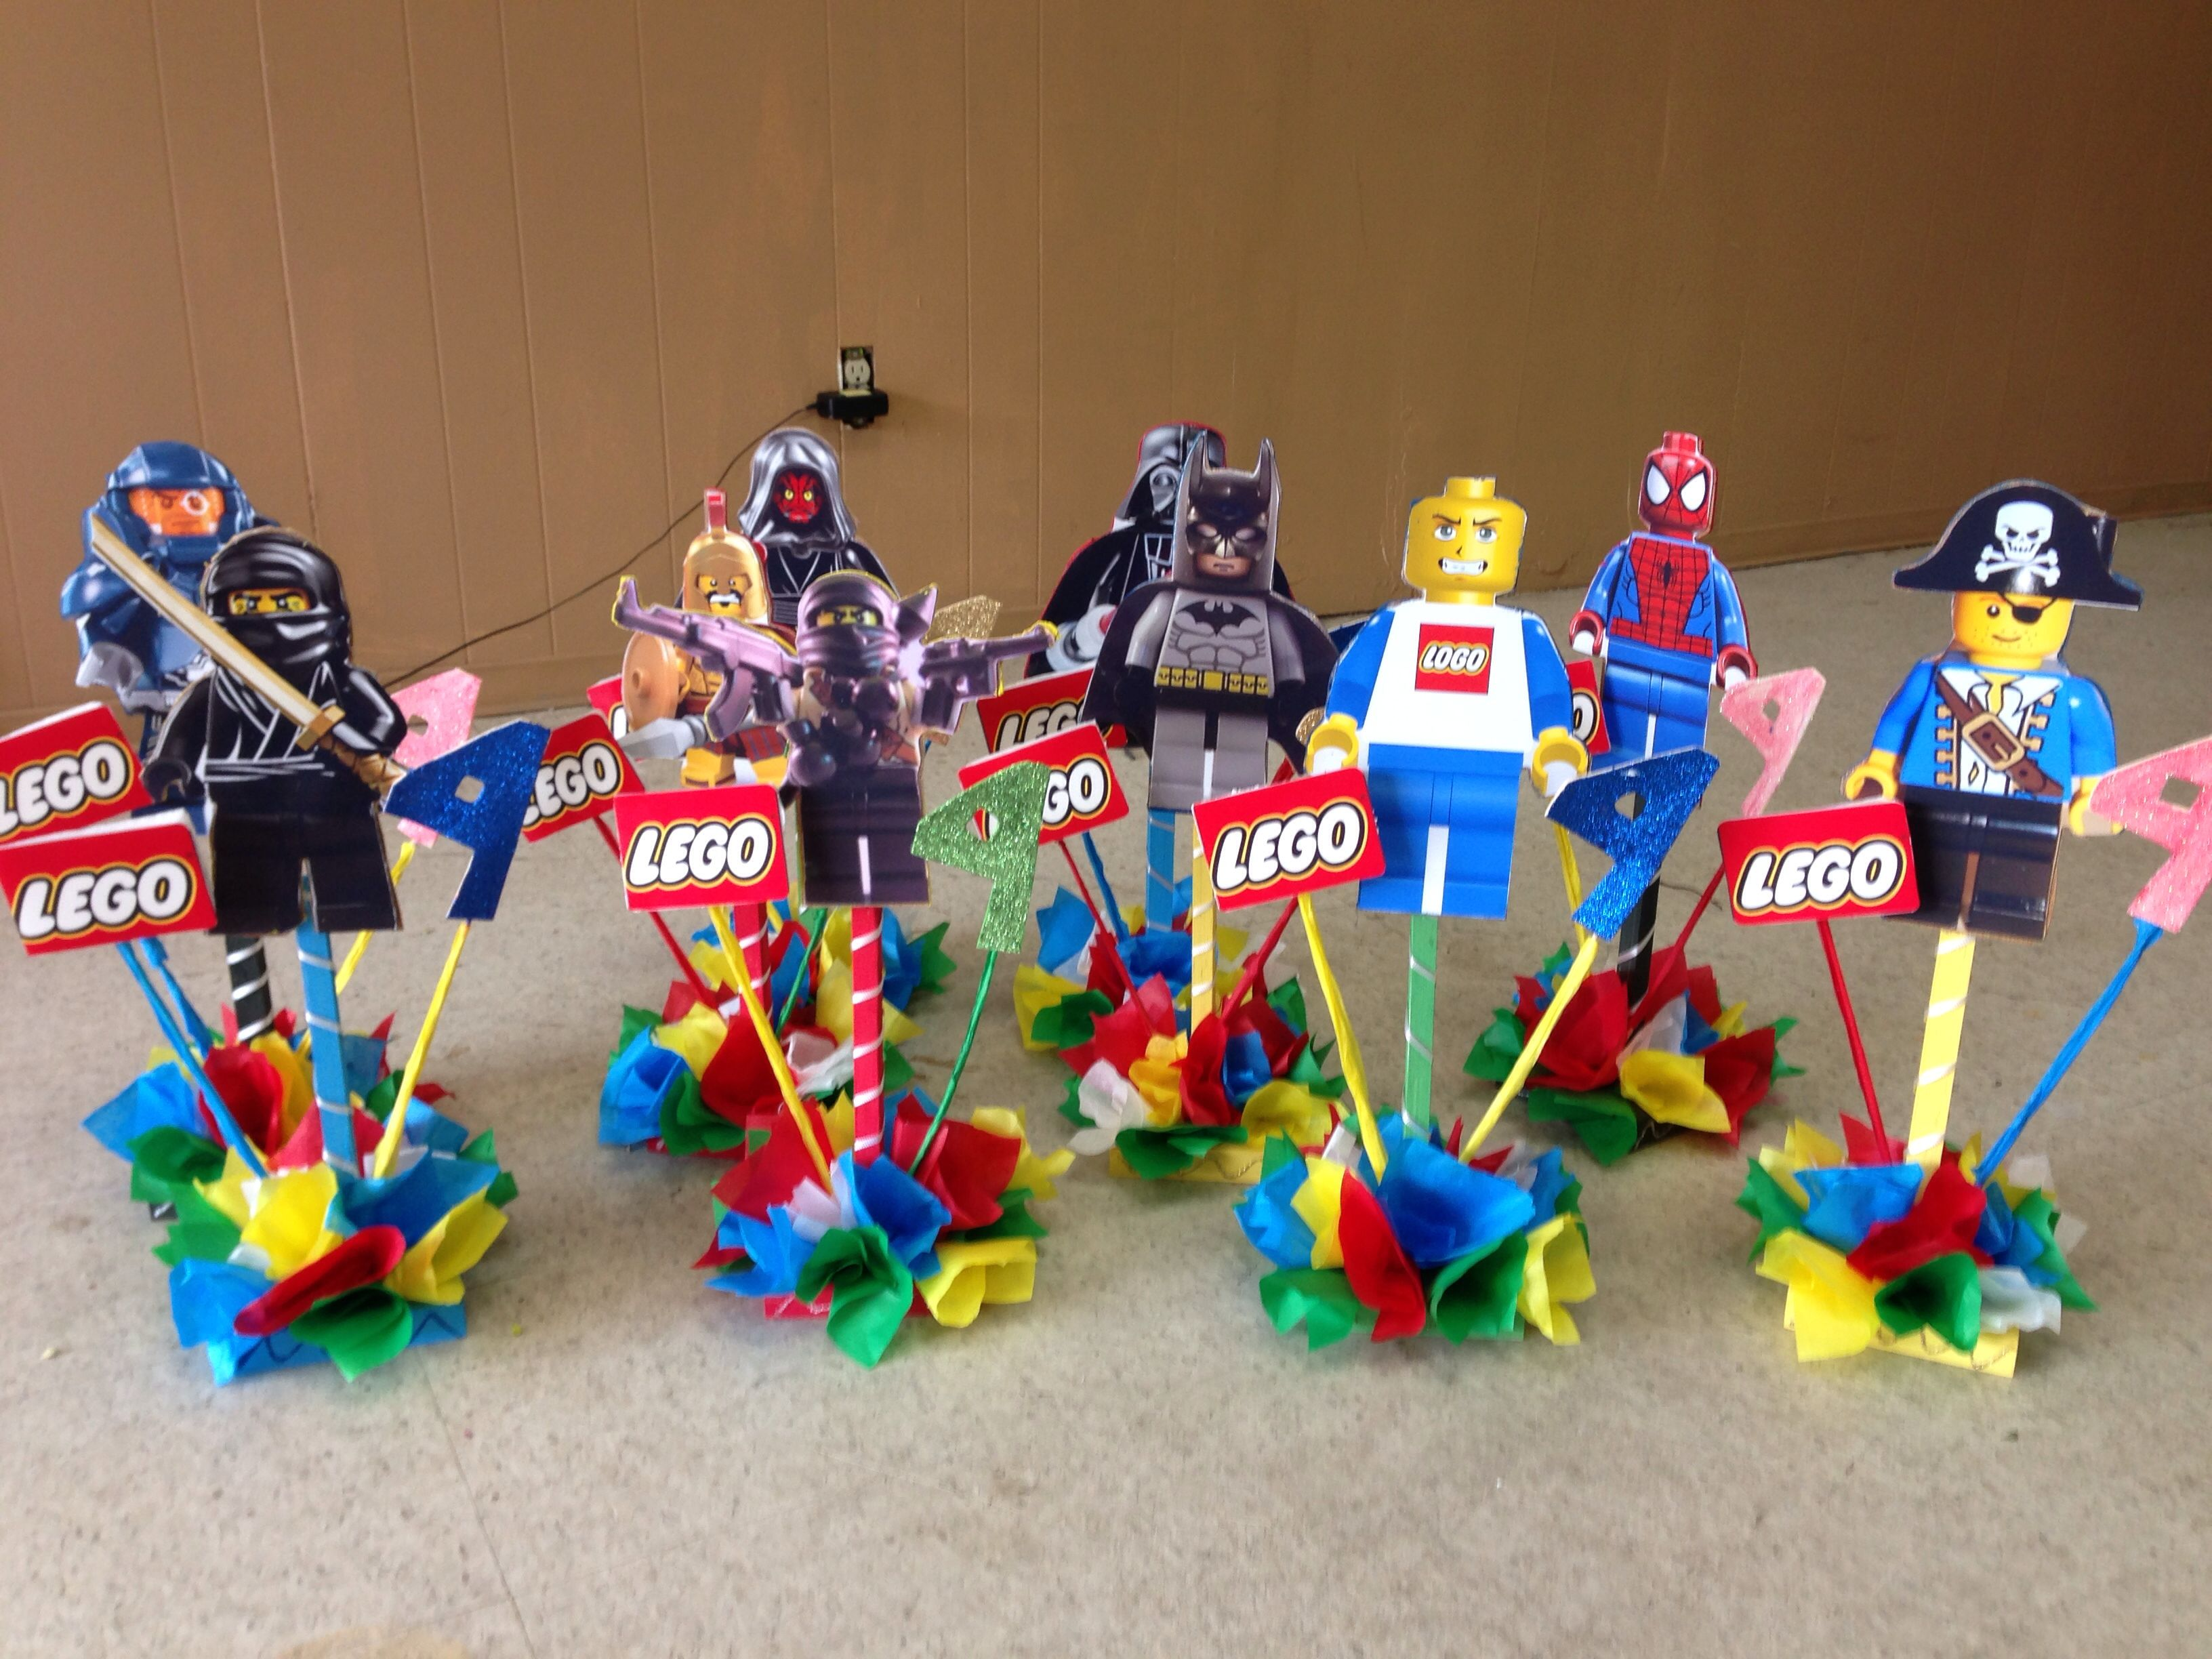 Lego centerpiece centerpieces pinterest